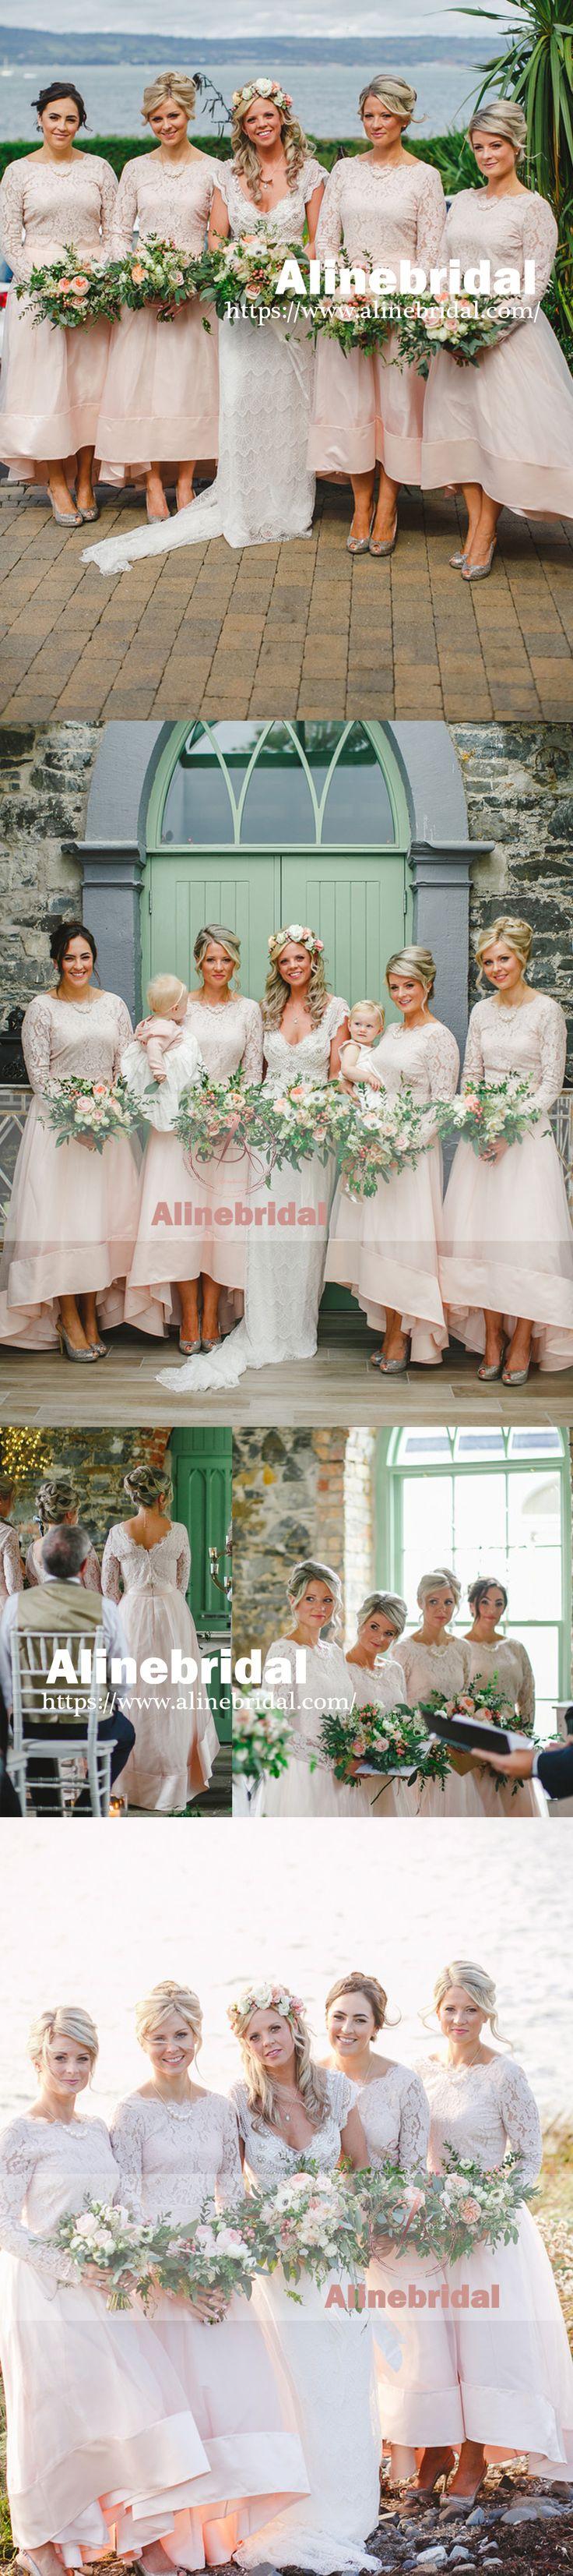 Long Sleeve Lace Top Unique High Low Ankle Length A-line Bridesmaid Dresses. AB1199